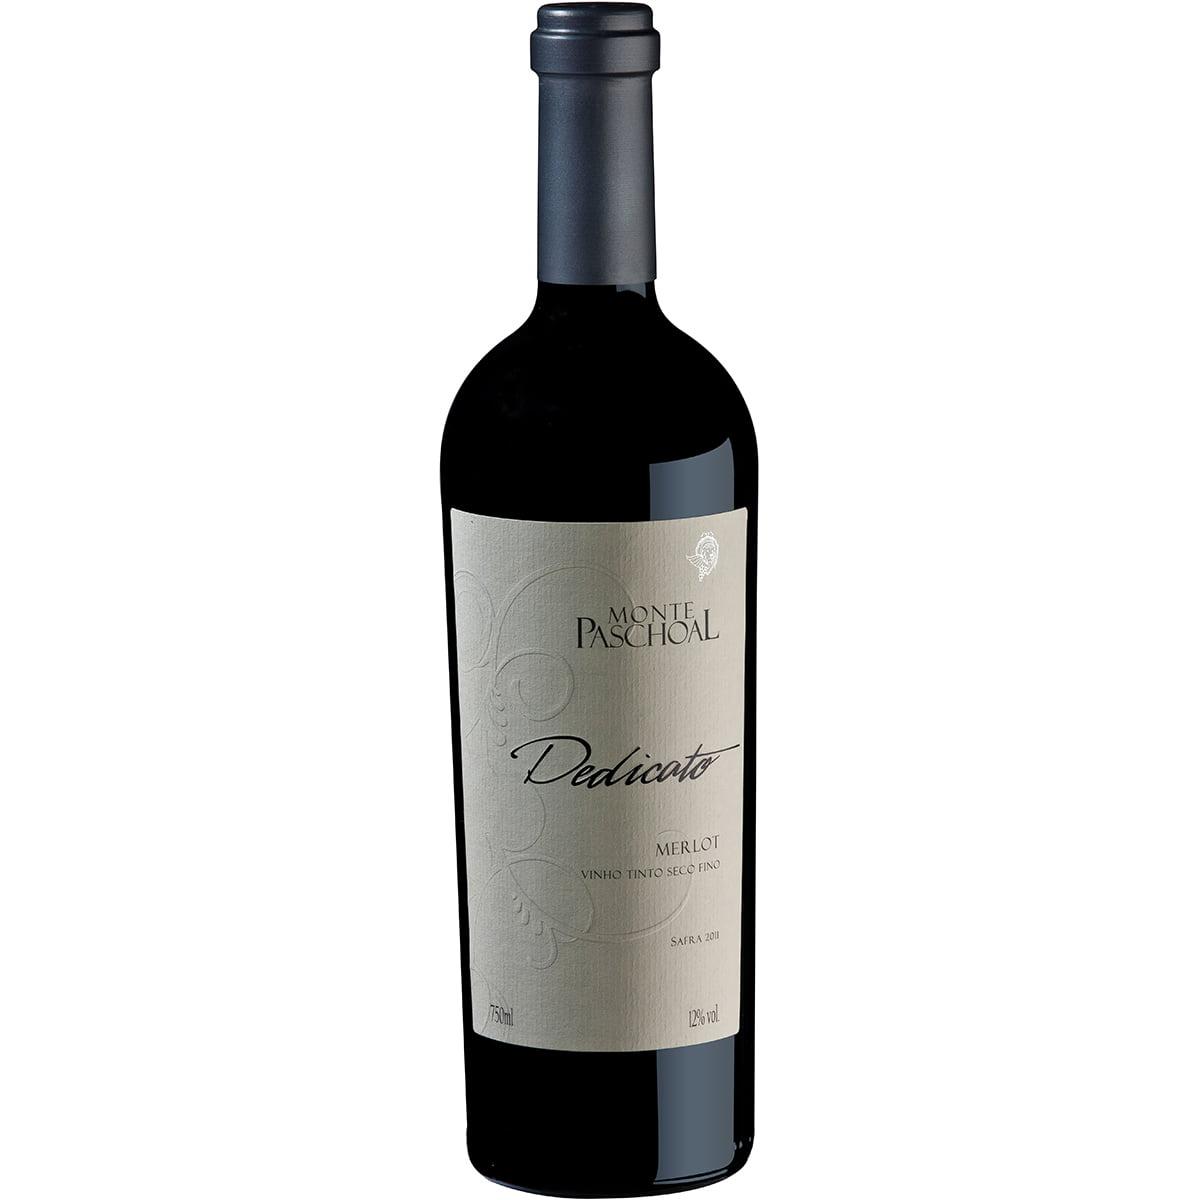 Vinho Monte Paschoal Dedicato Merlot Tinto Seco 750ml